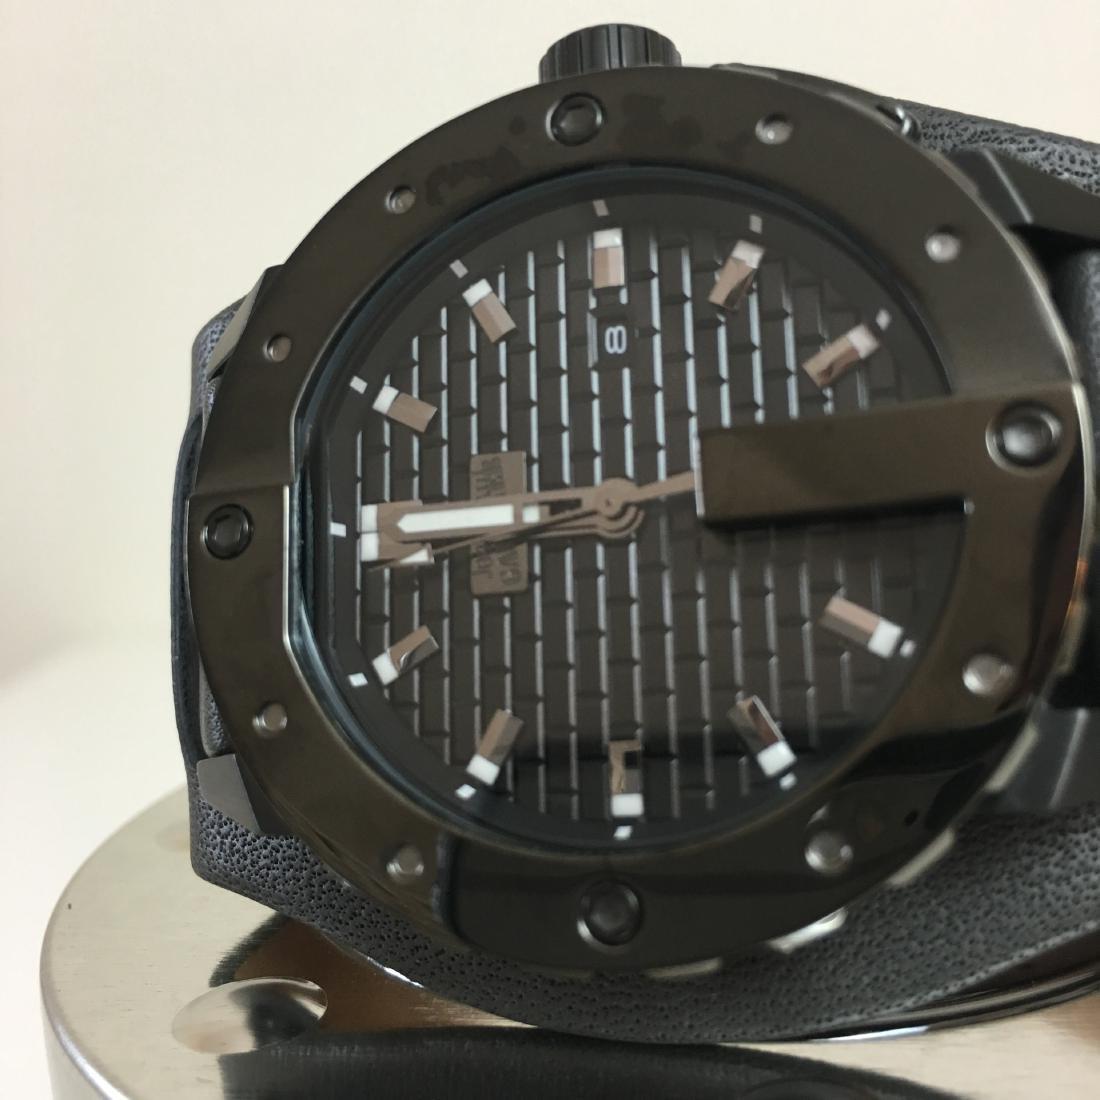 Jean Paul Gaultier – Men's Designer Wrist Watch - 3